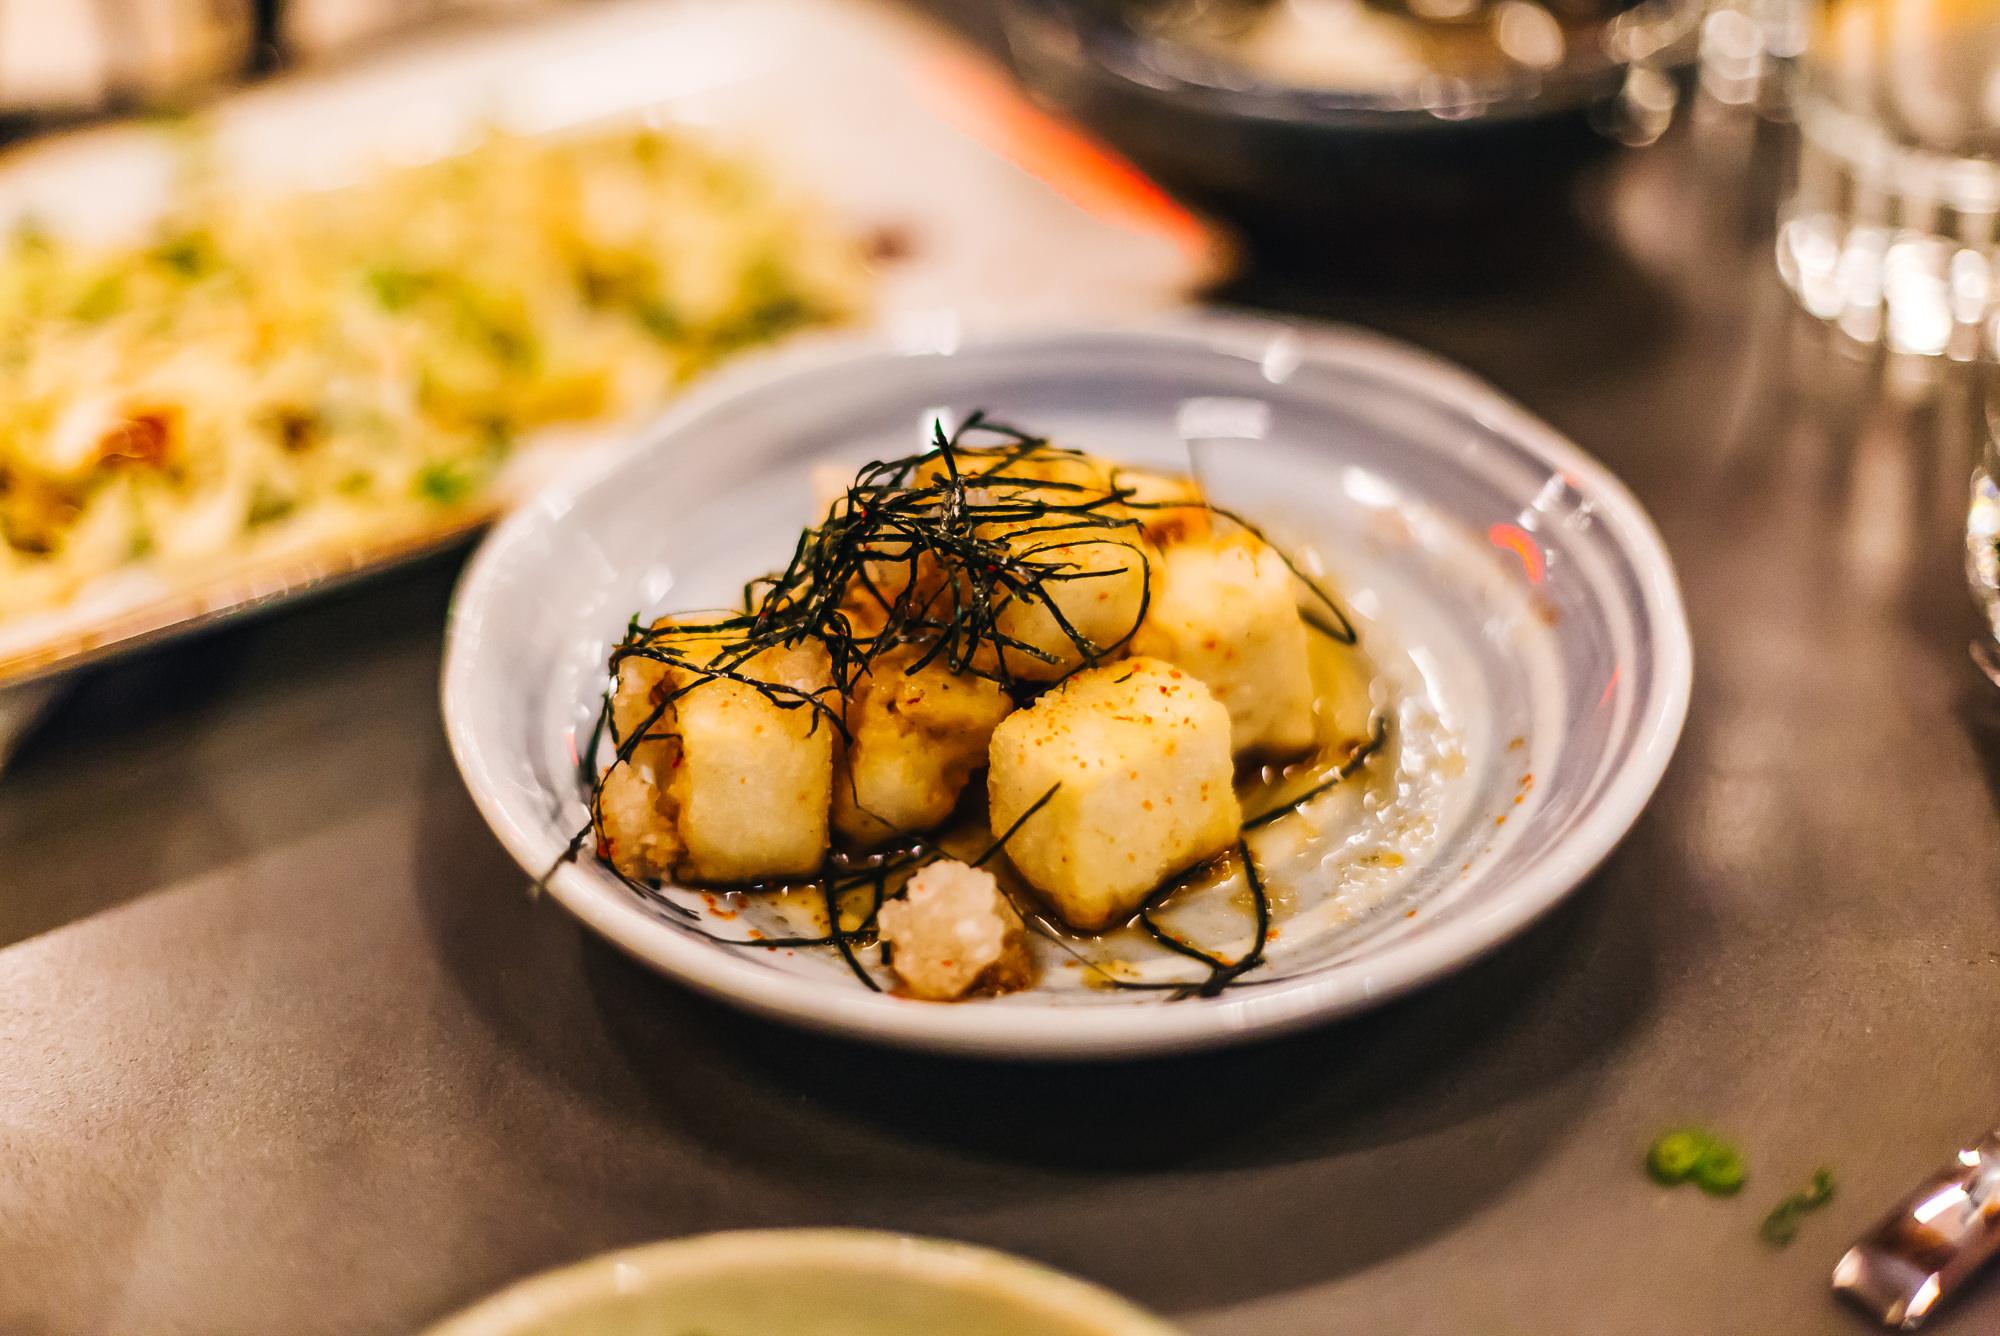 Agedashi tofu - fried tofu